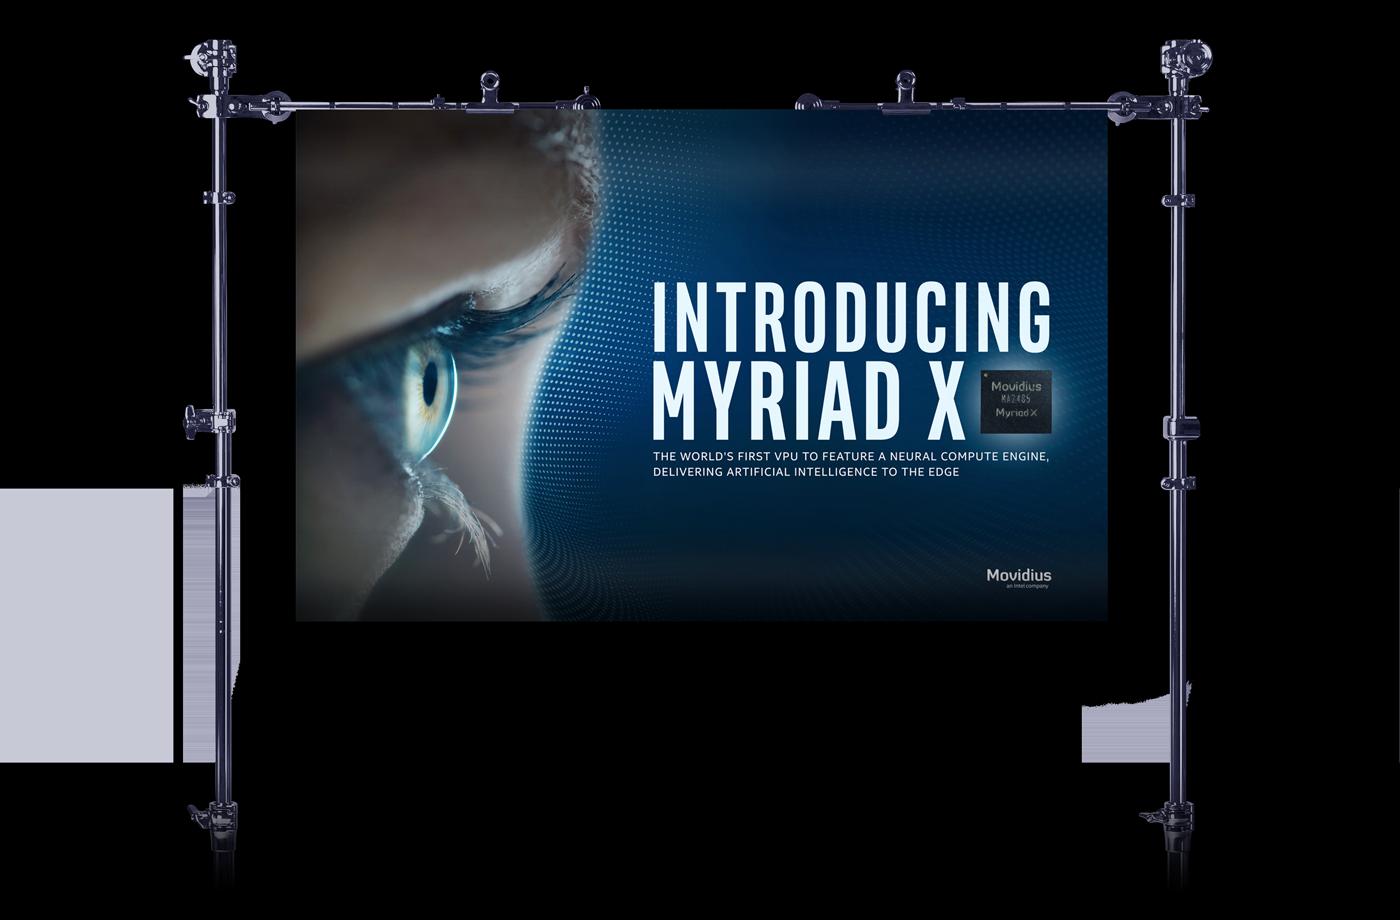 myriad_poster_mockup.png